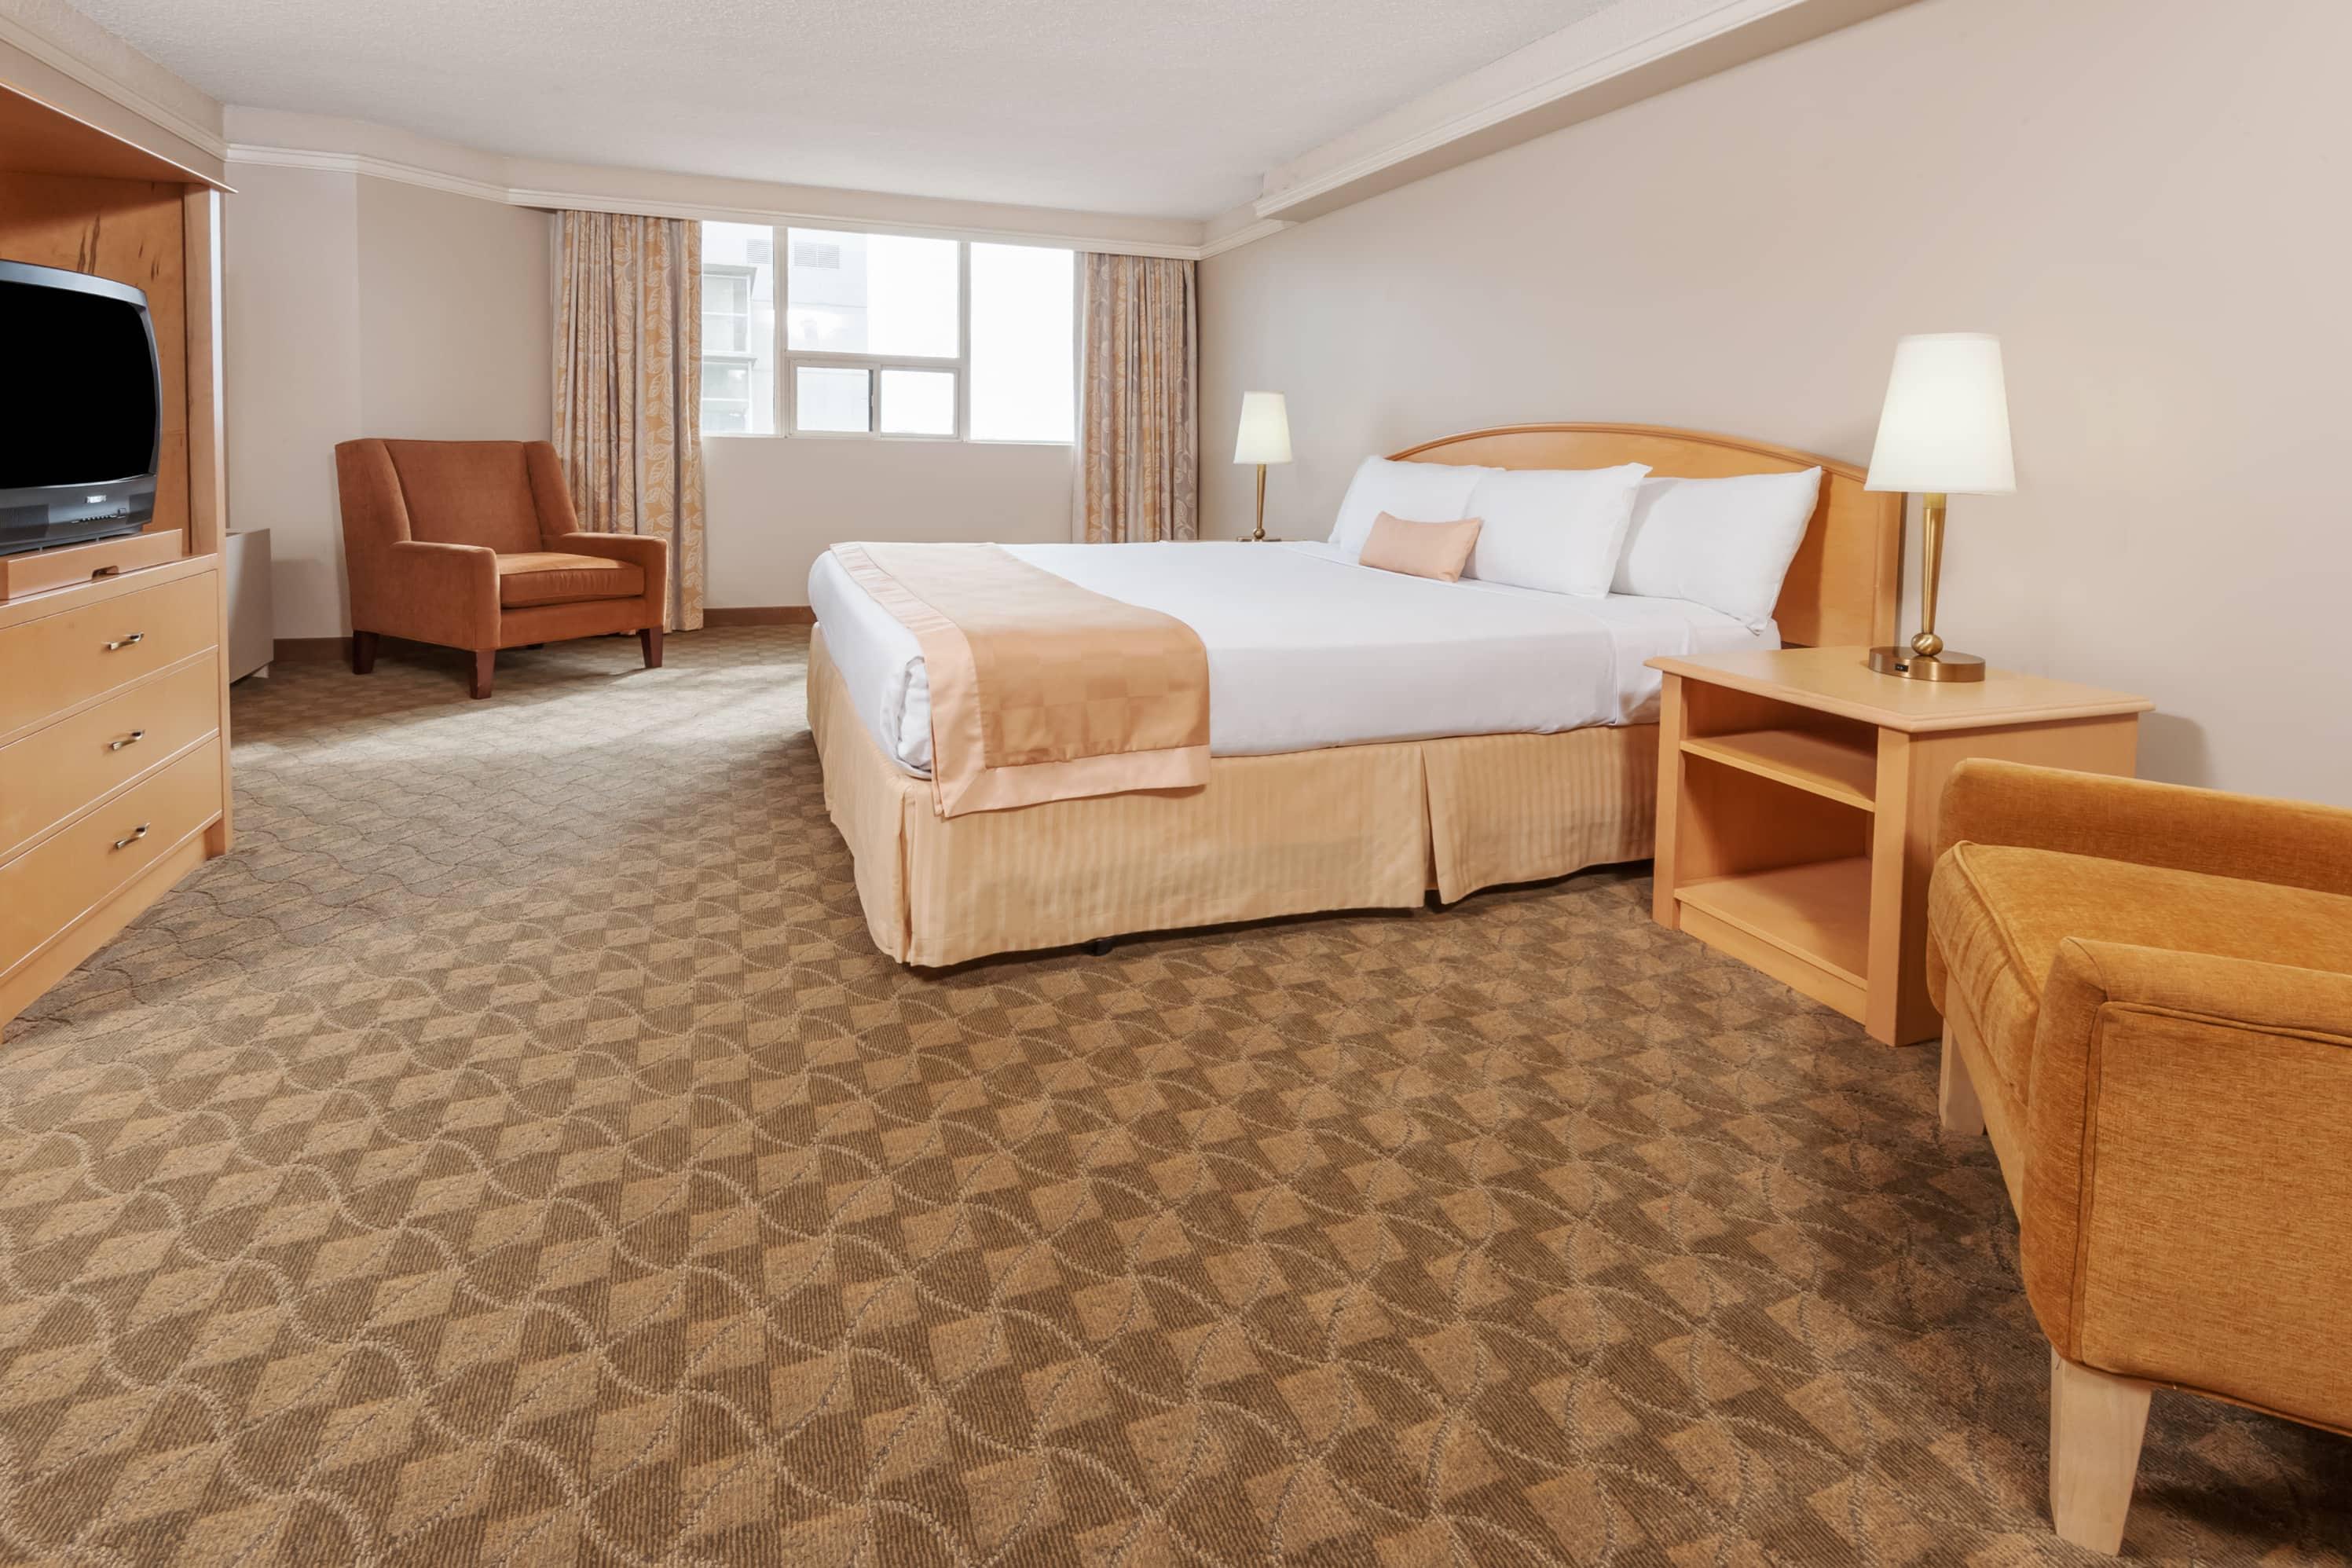 Guest room at the Ramada Edmonton Hotel & Conference Centre in Edmonton, Alberta